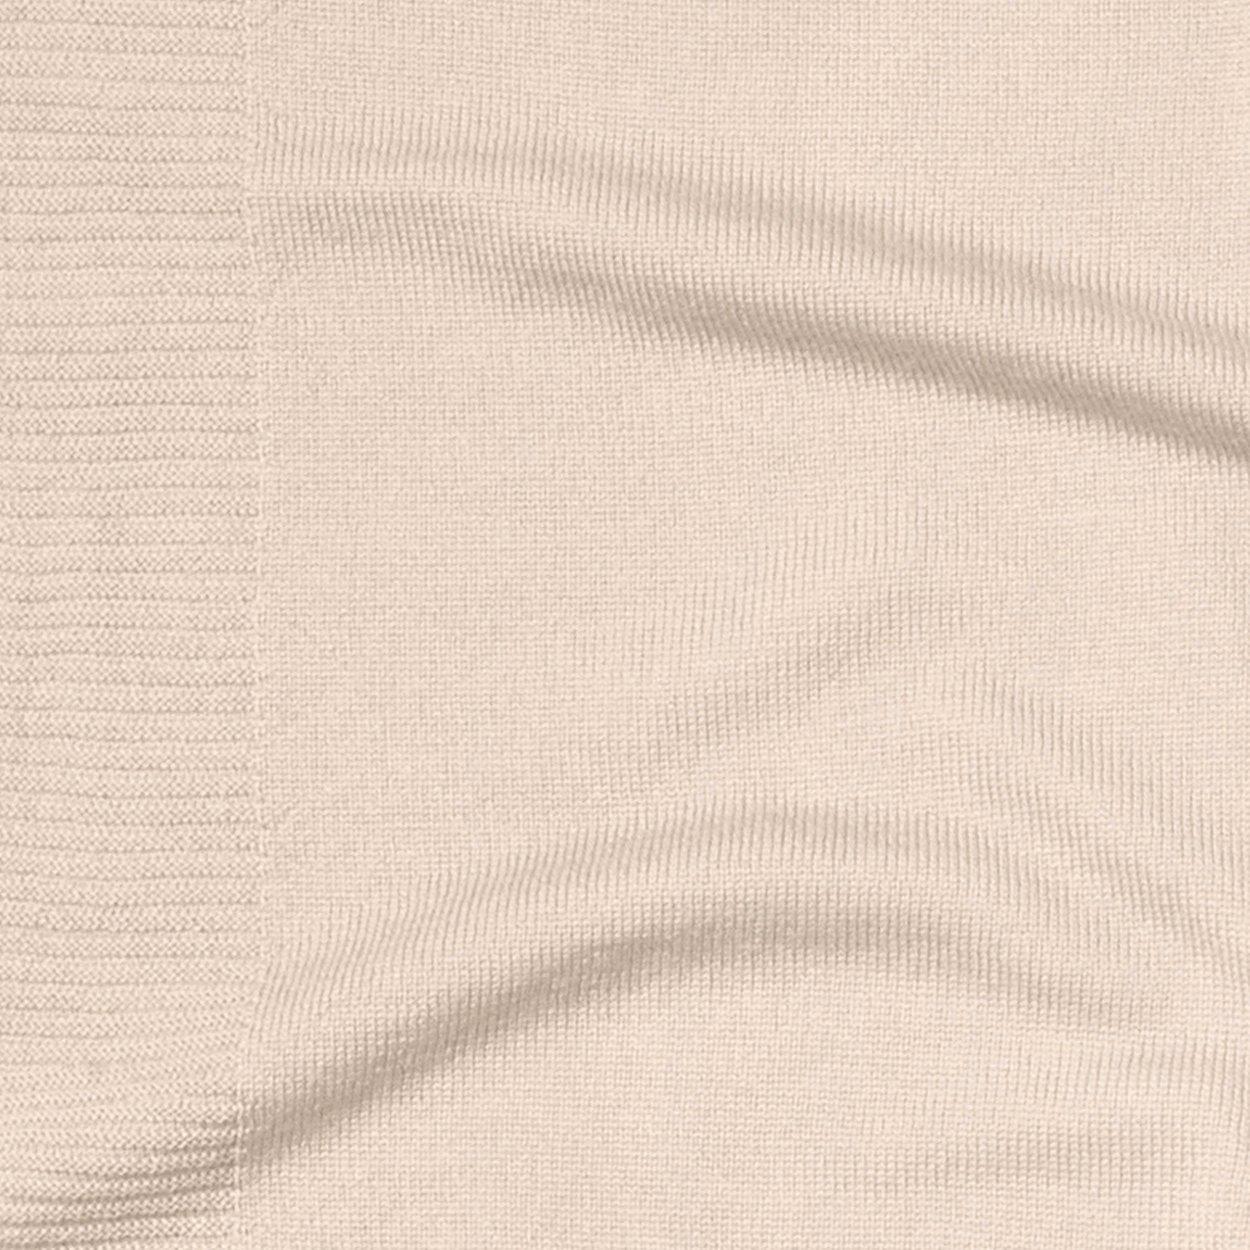 Ideale Erstlingsdecke Kuschelige Babydecke Merino Decke Baby grau nordic coast 100/% Baumwolle Babydecke 100x70 reine Merino Wolldecke Baby